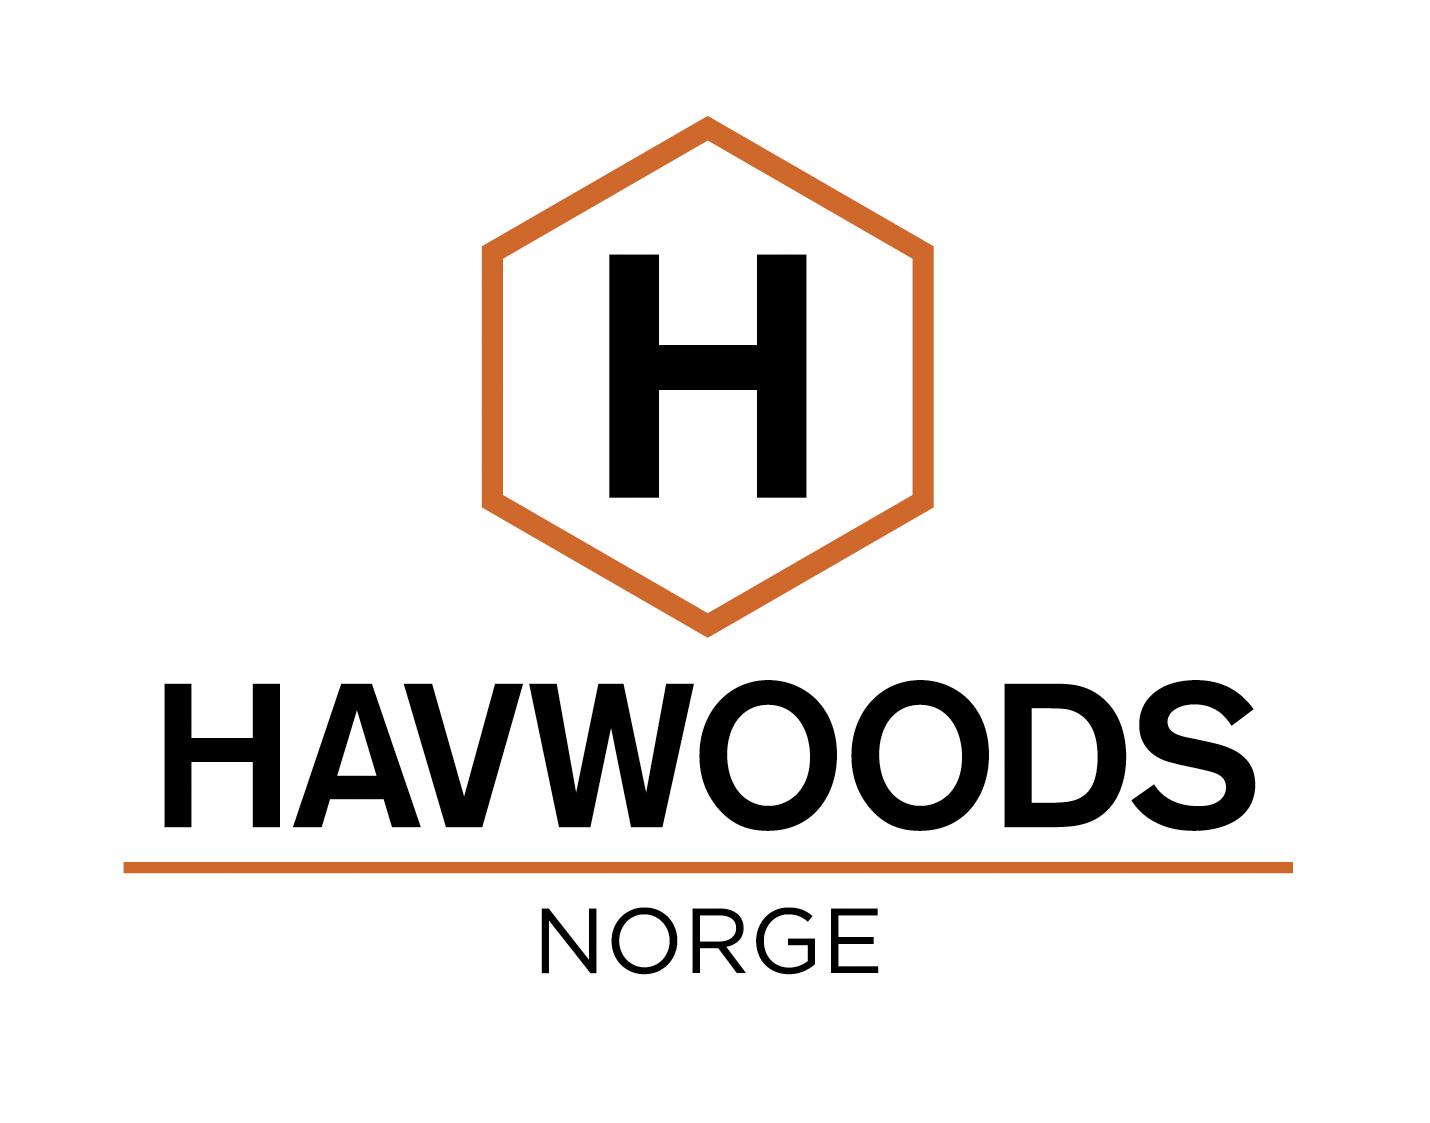 Havwoods Norge (SPONSOR)